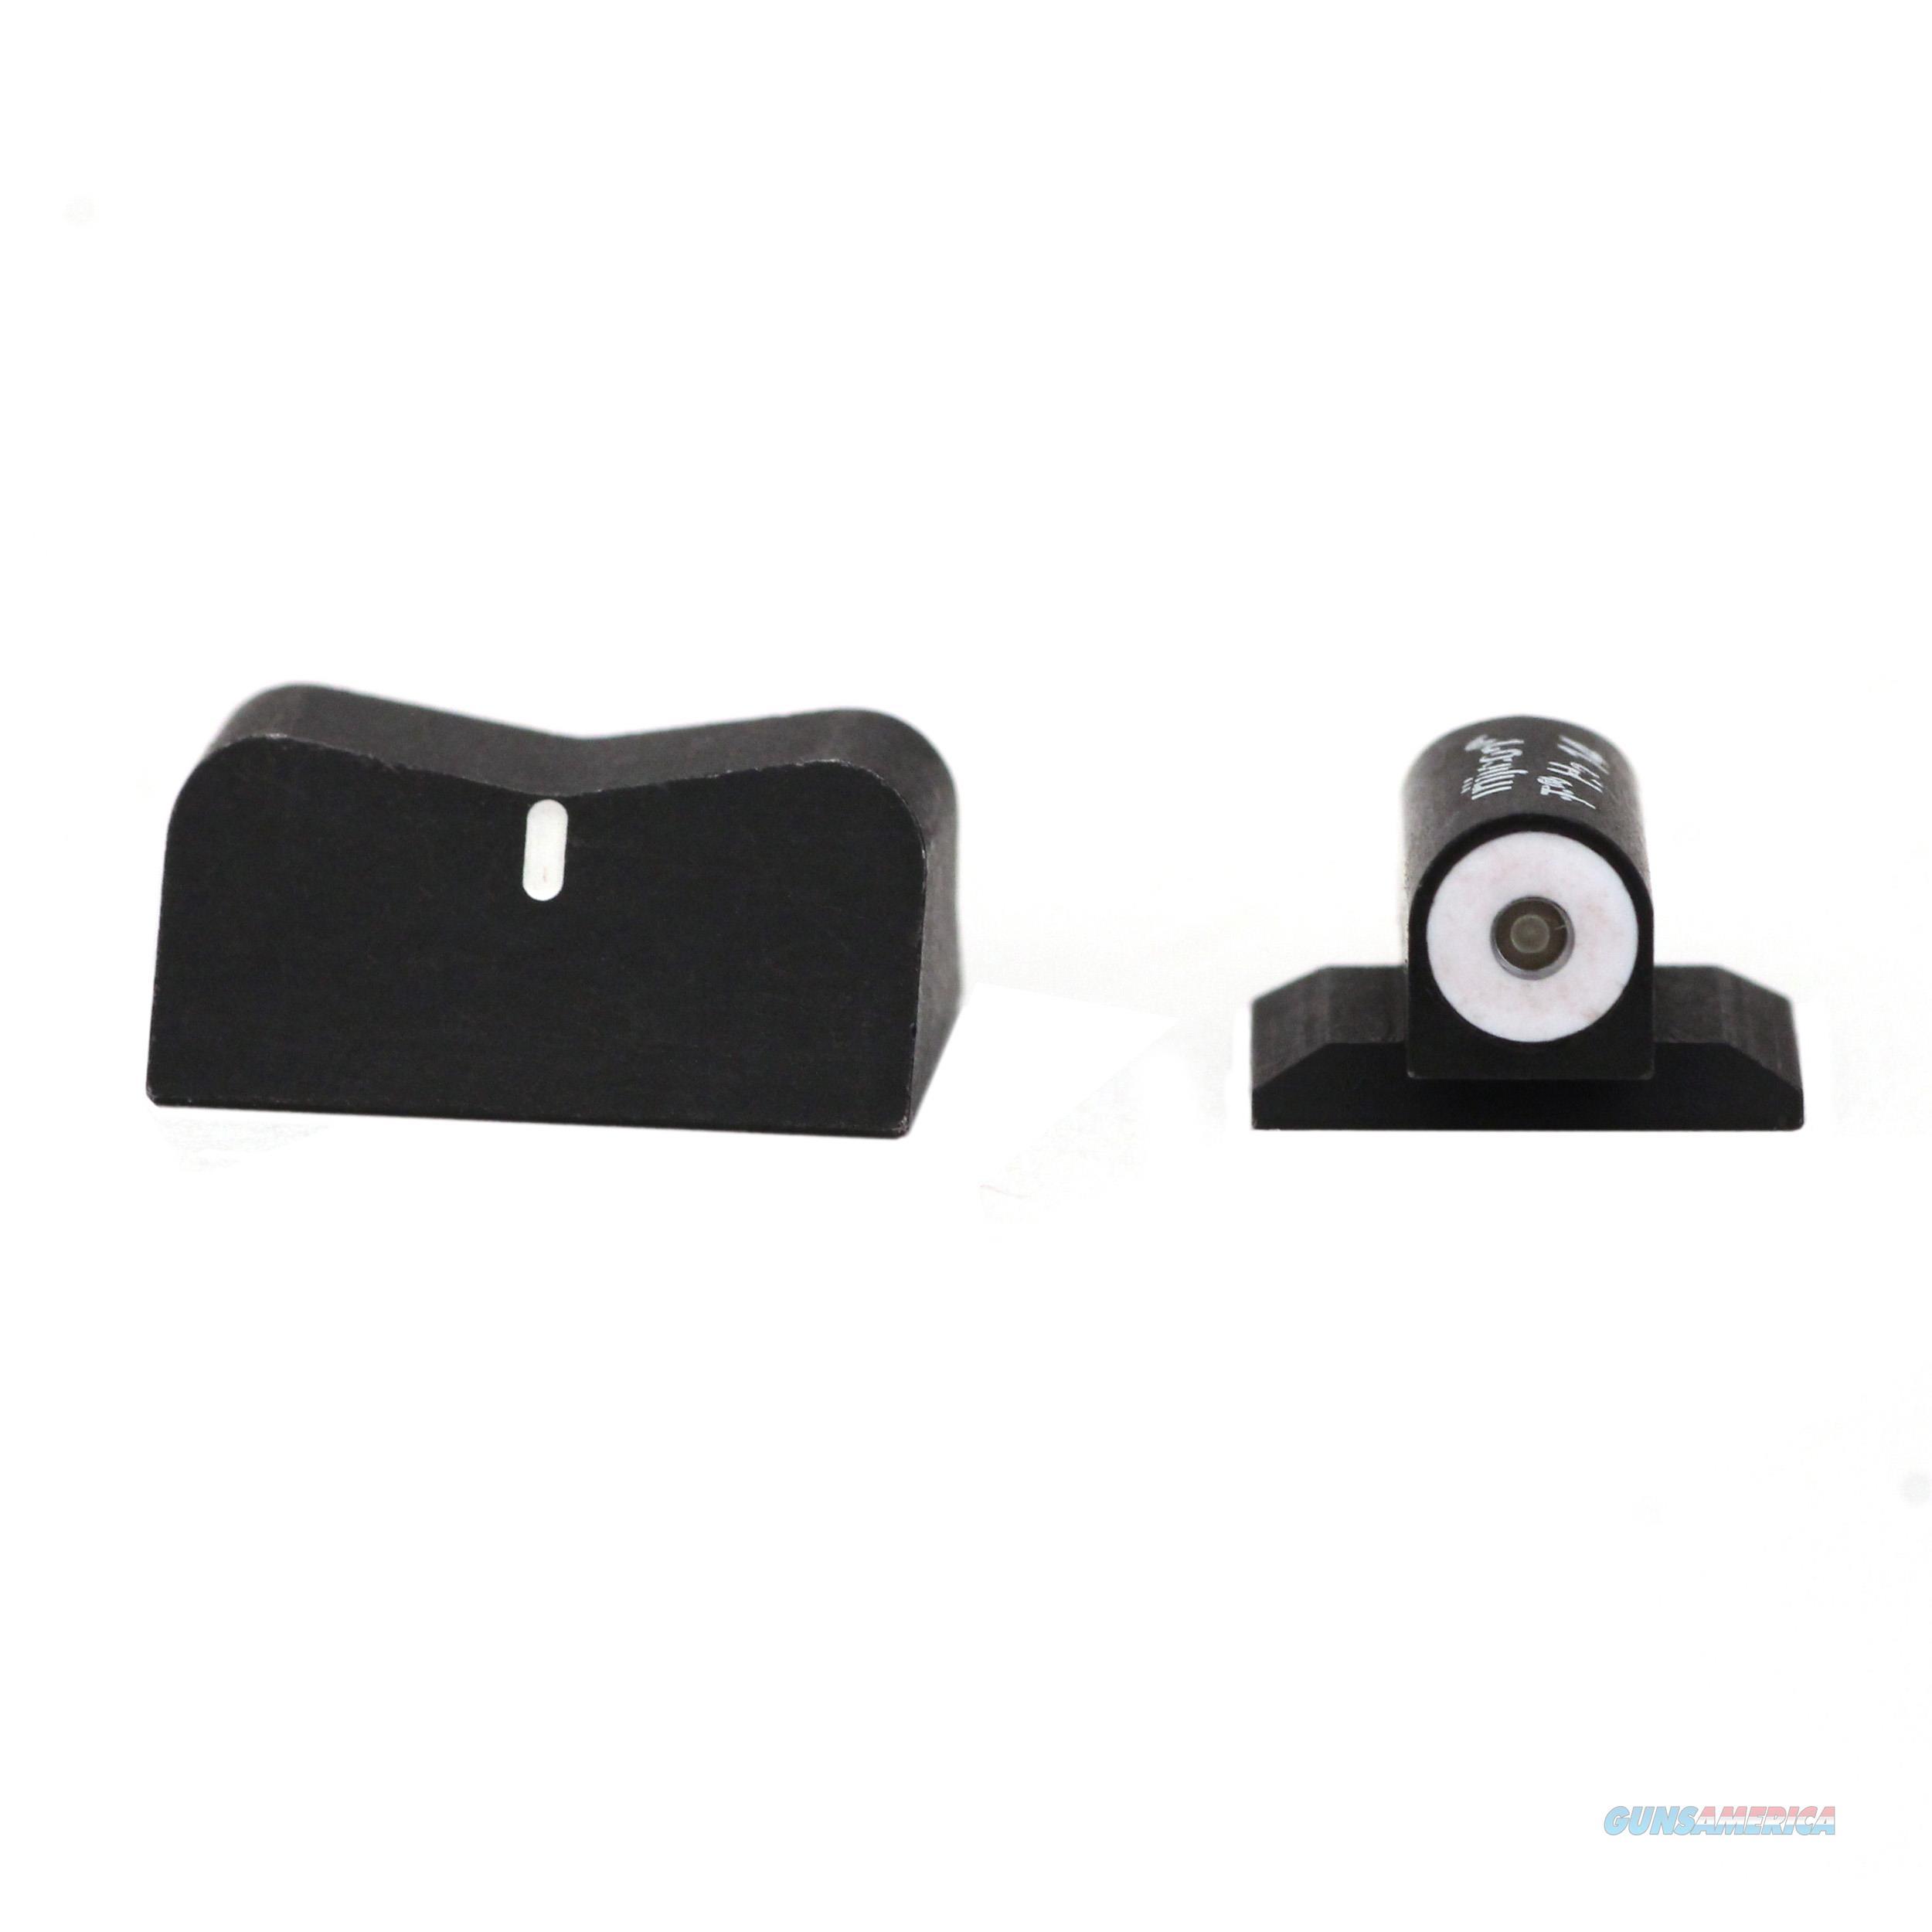 Xs Sights Dxw Big Dot SW-0022P-3  Non-Guns > Iron/Metal/Peep Sights